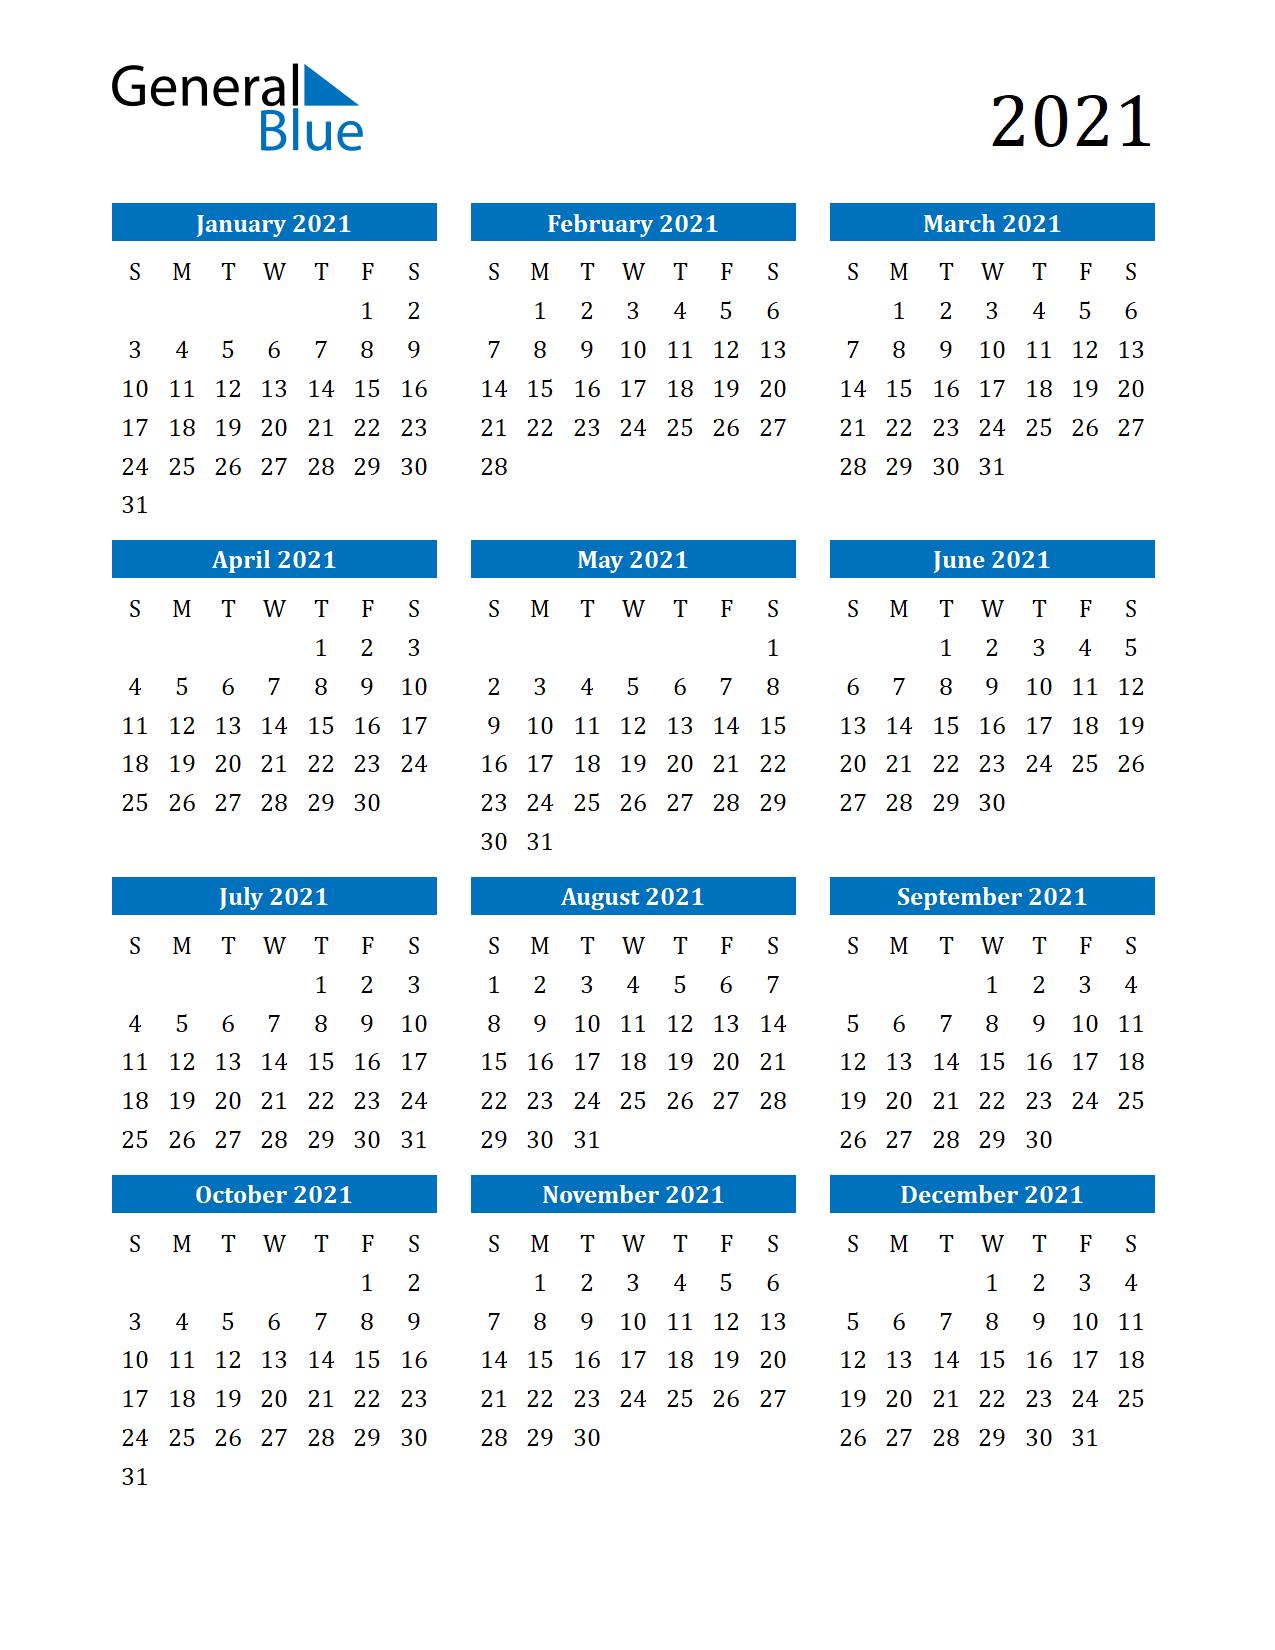 Free Printable 12 Month 2021 Calendar With Lines-Excel 2021 Calendar Vertical List